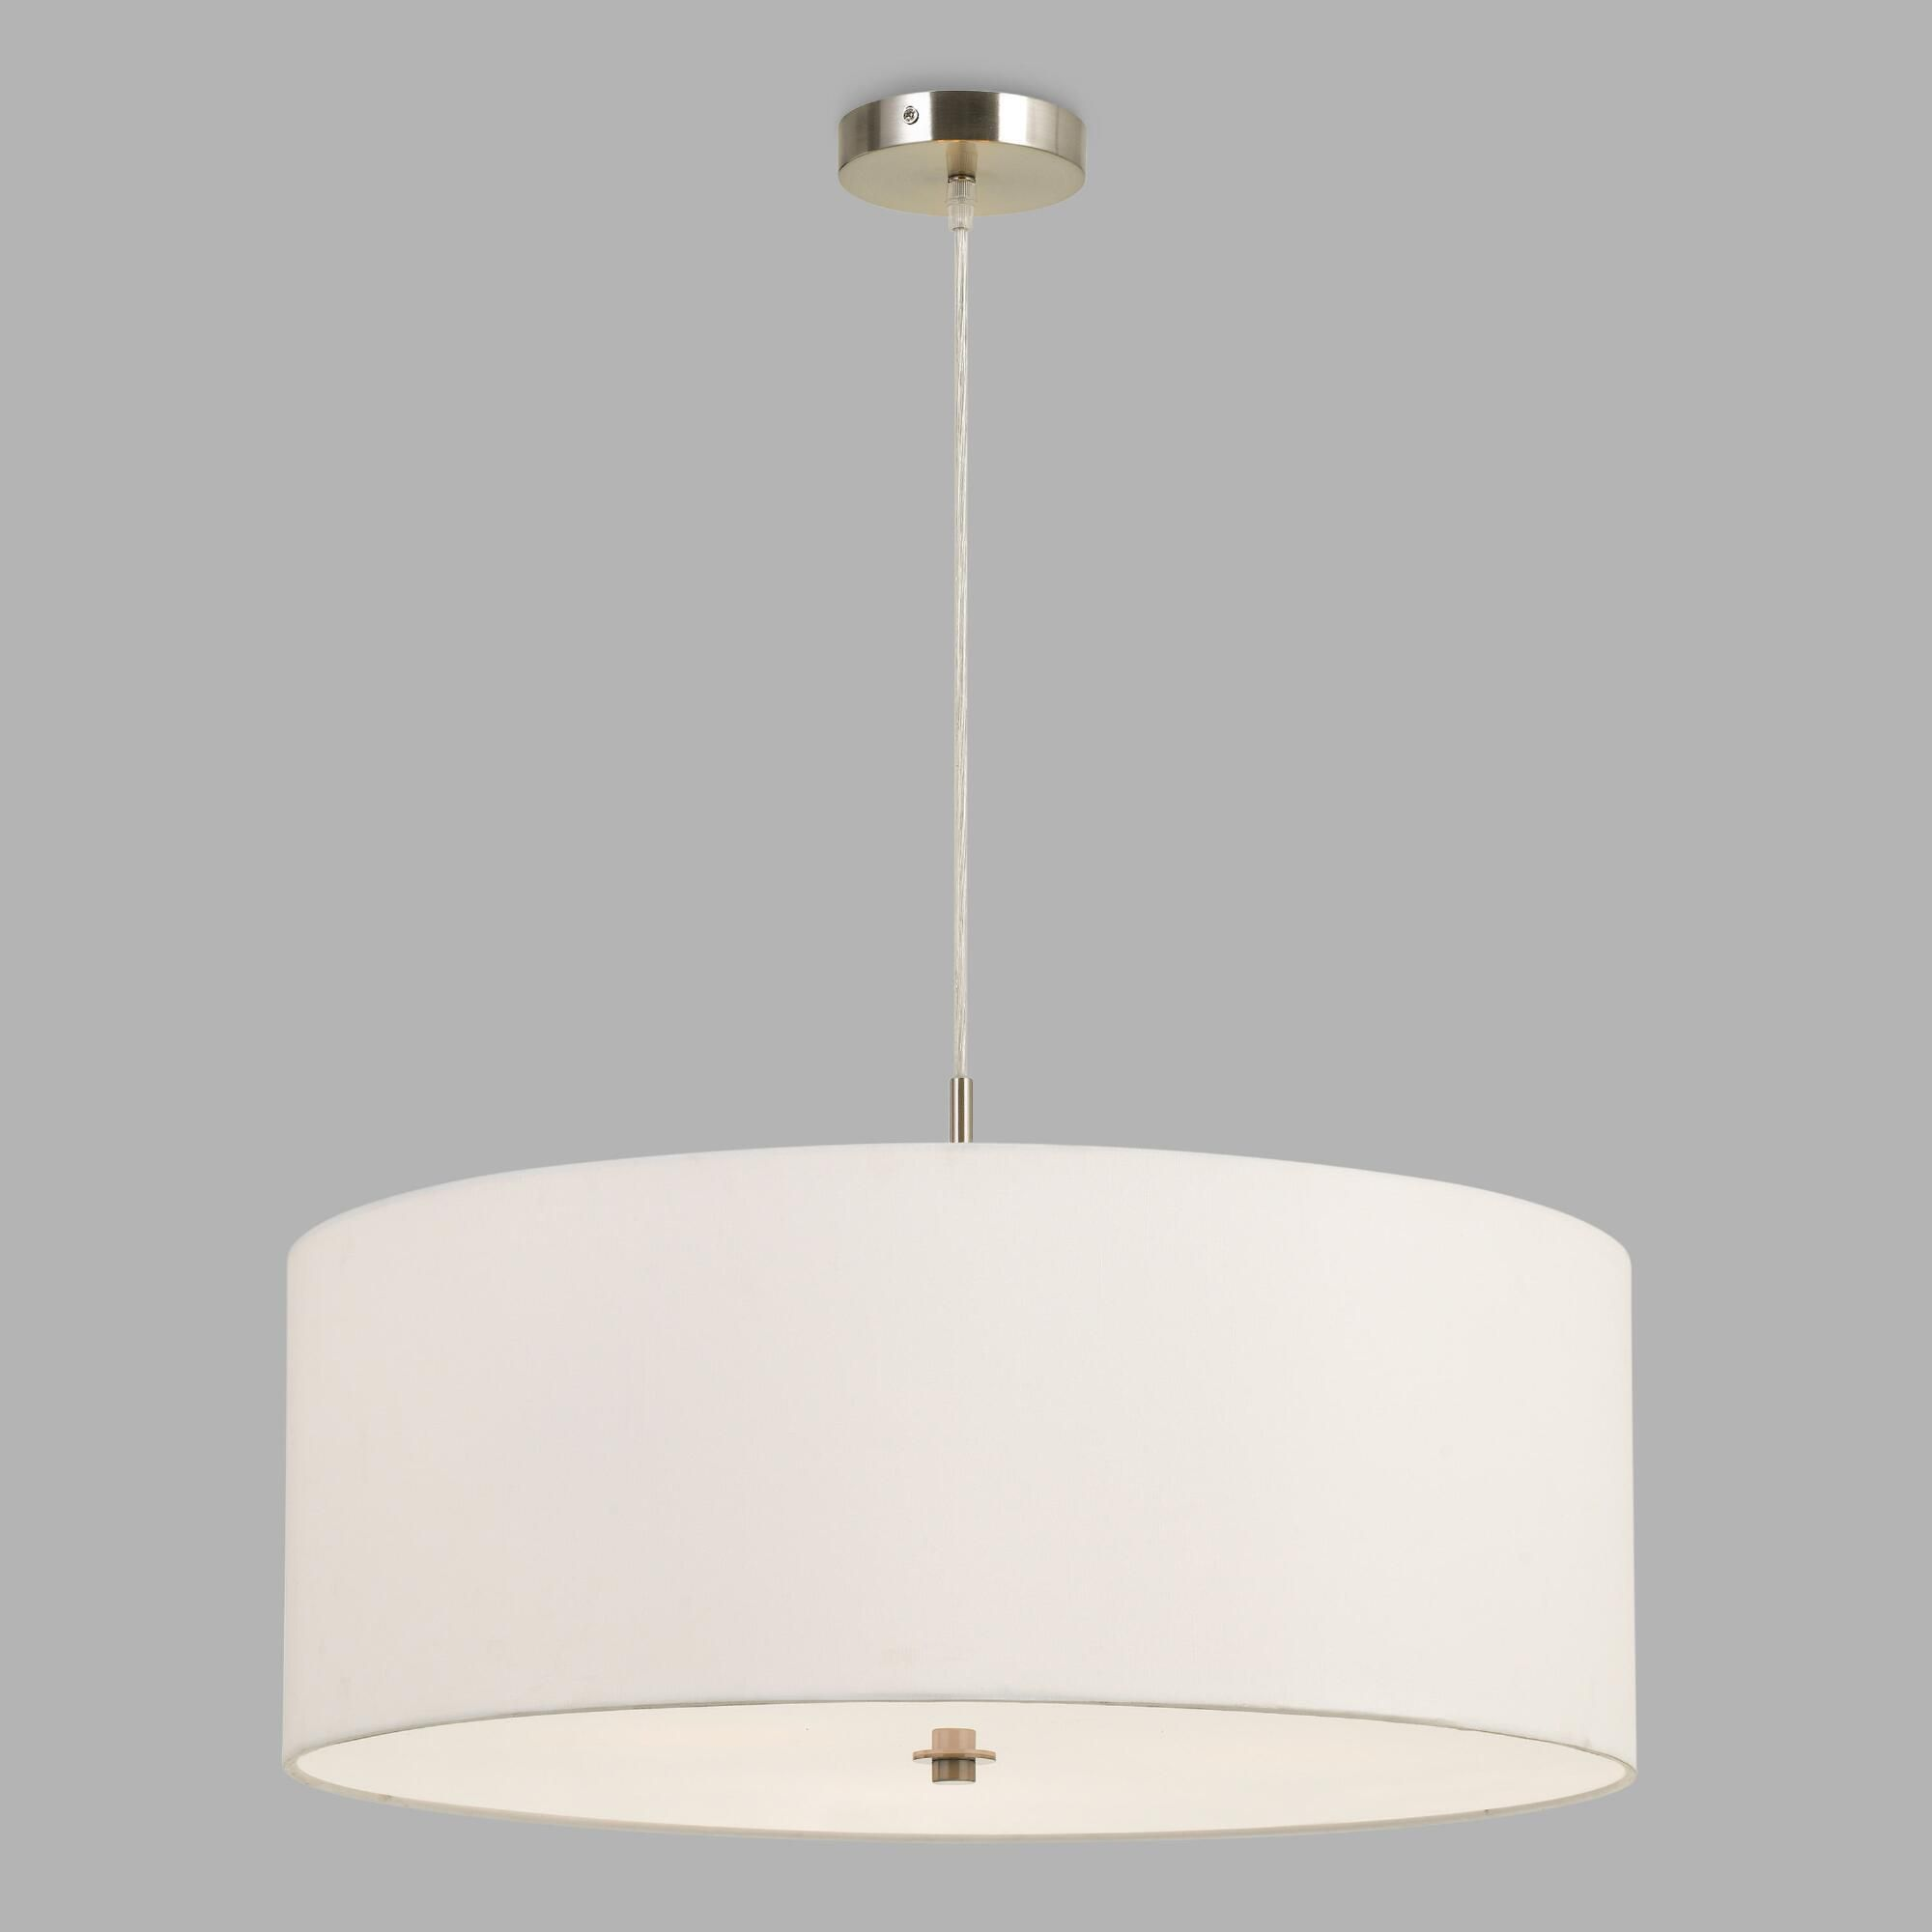 Large White Fabric Drum 3 Light Billie Pendant Lamp Drum Shade